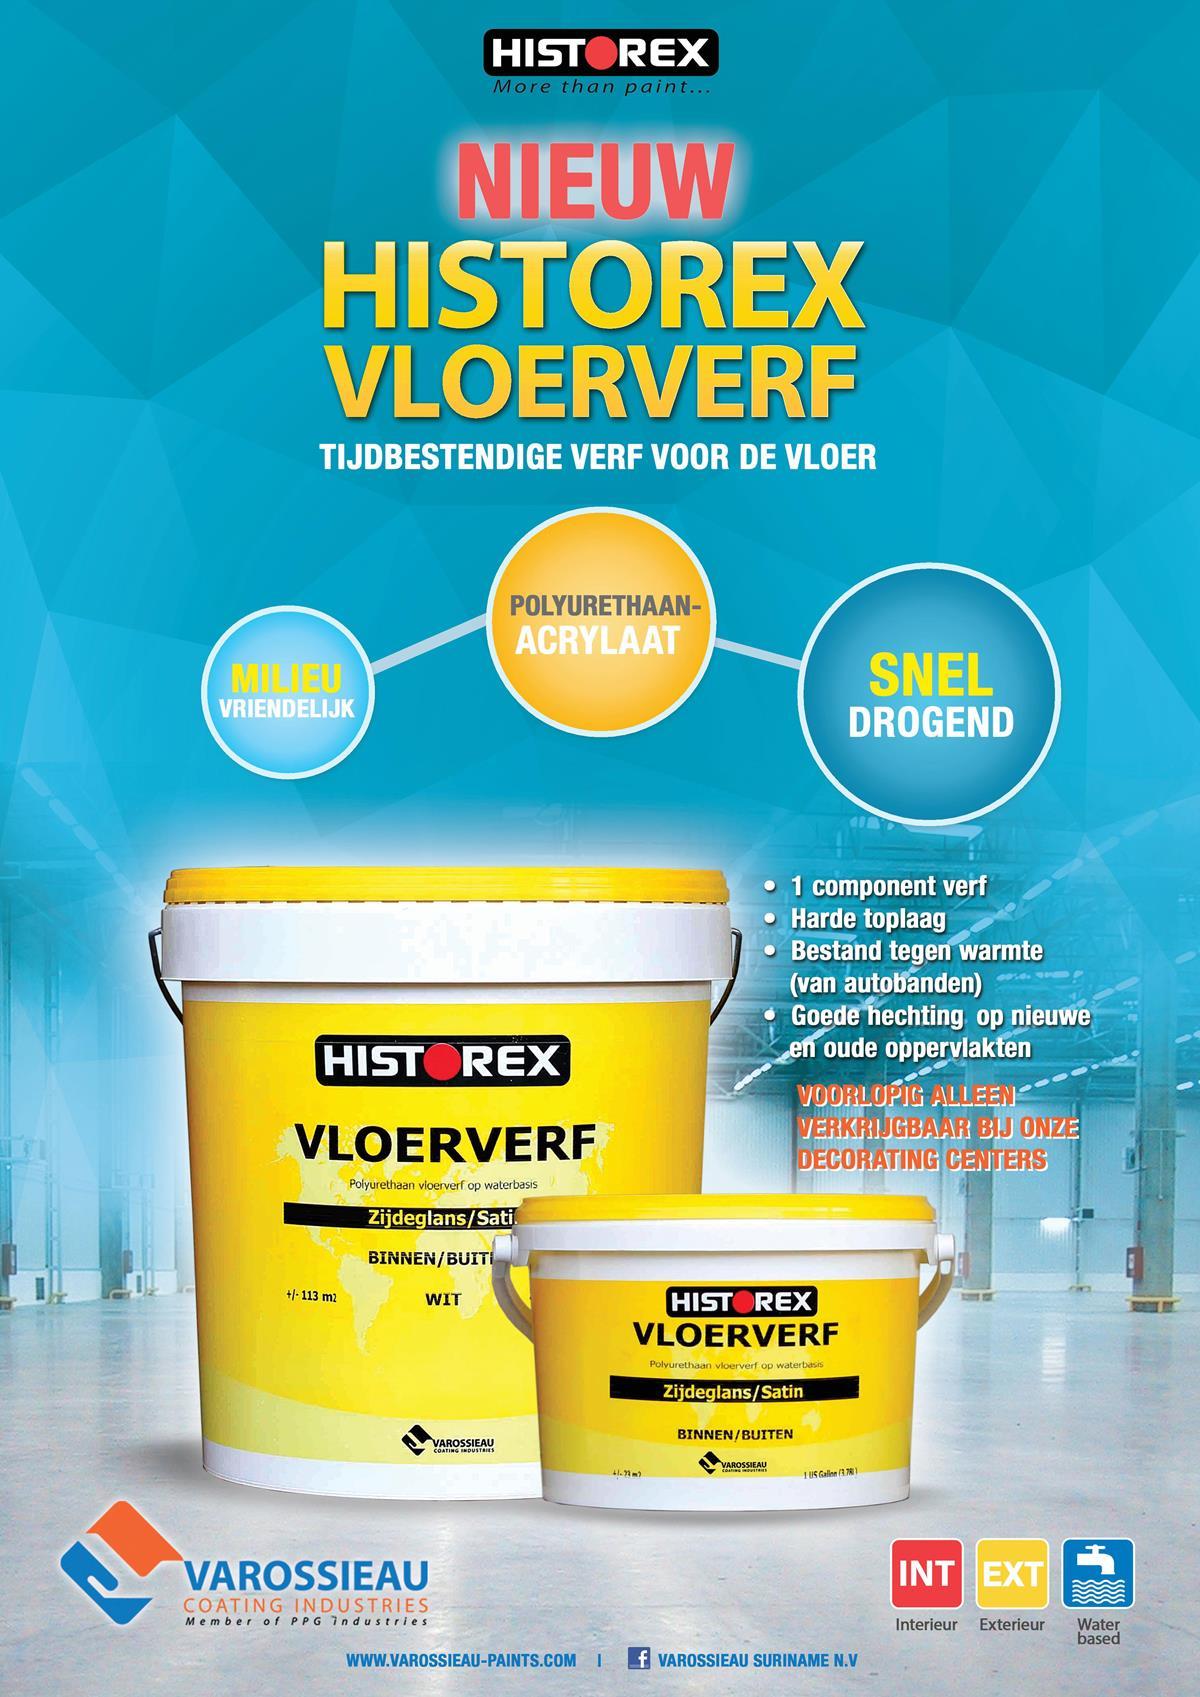 Historex vloerverf